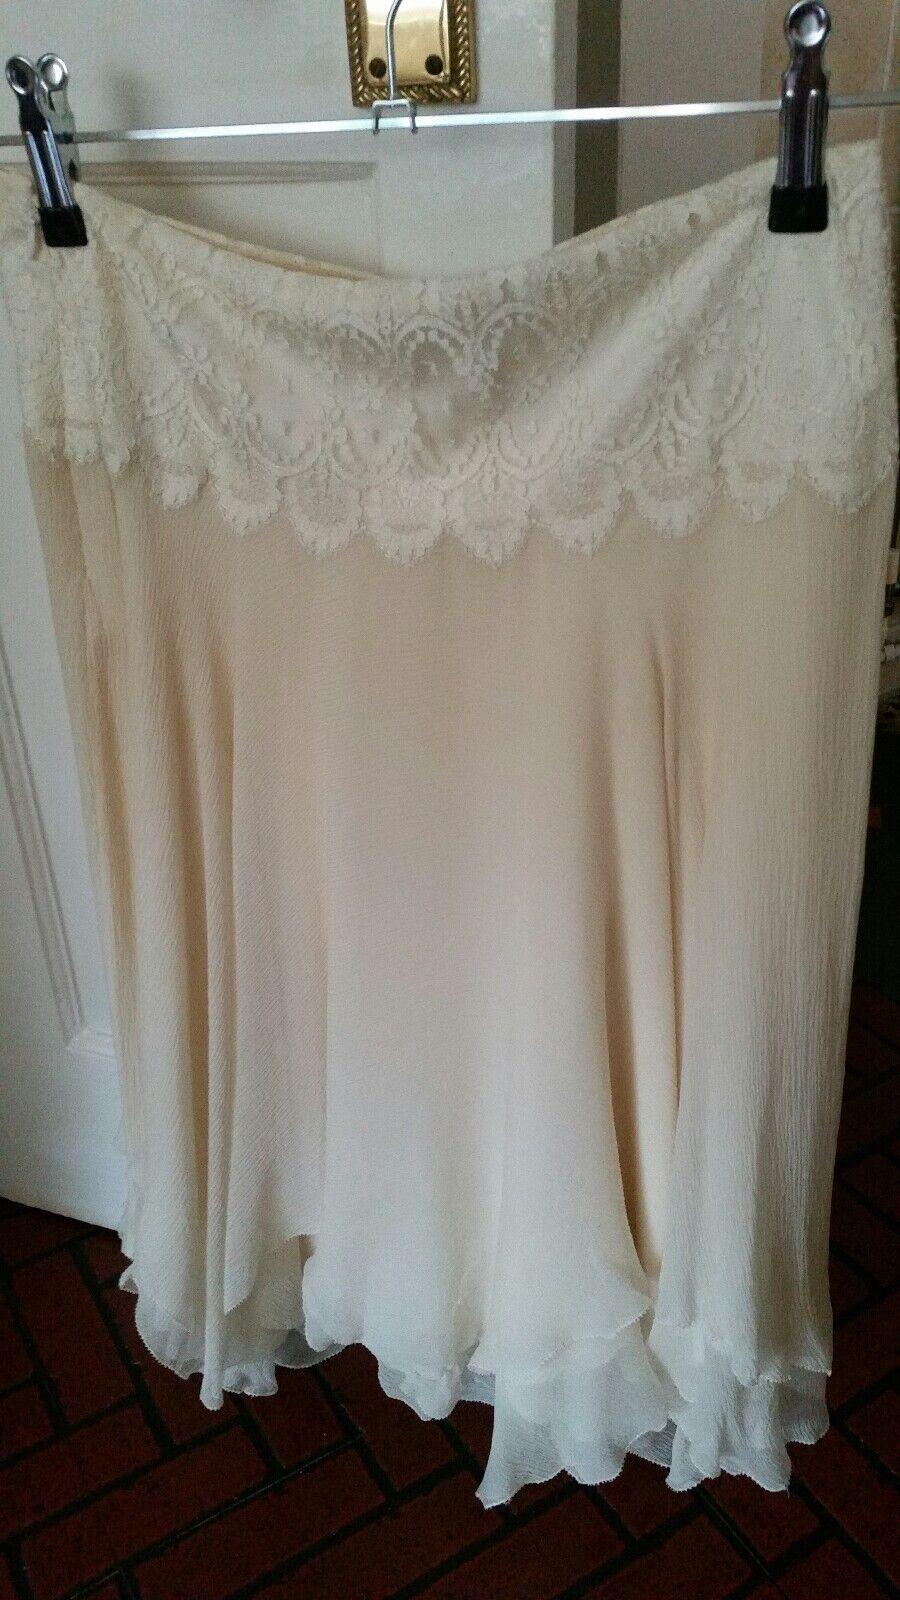 Ralph lauren skirt 100% silk formal size 8 lace detail cream knee length floaty